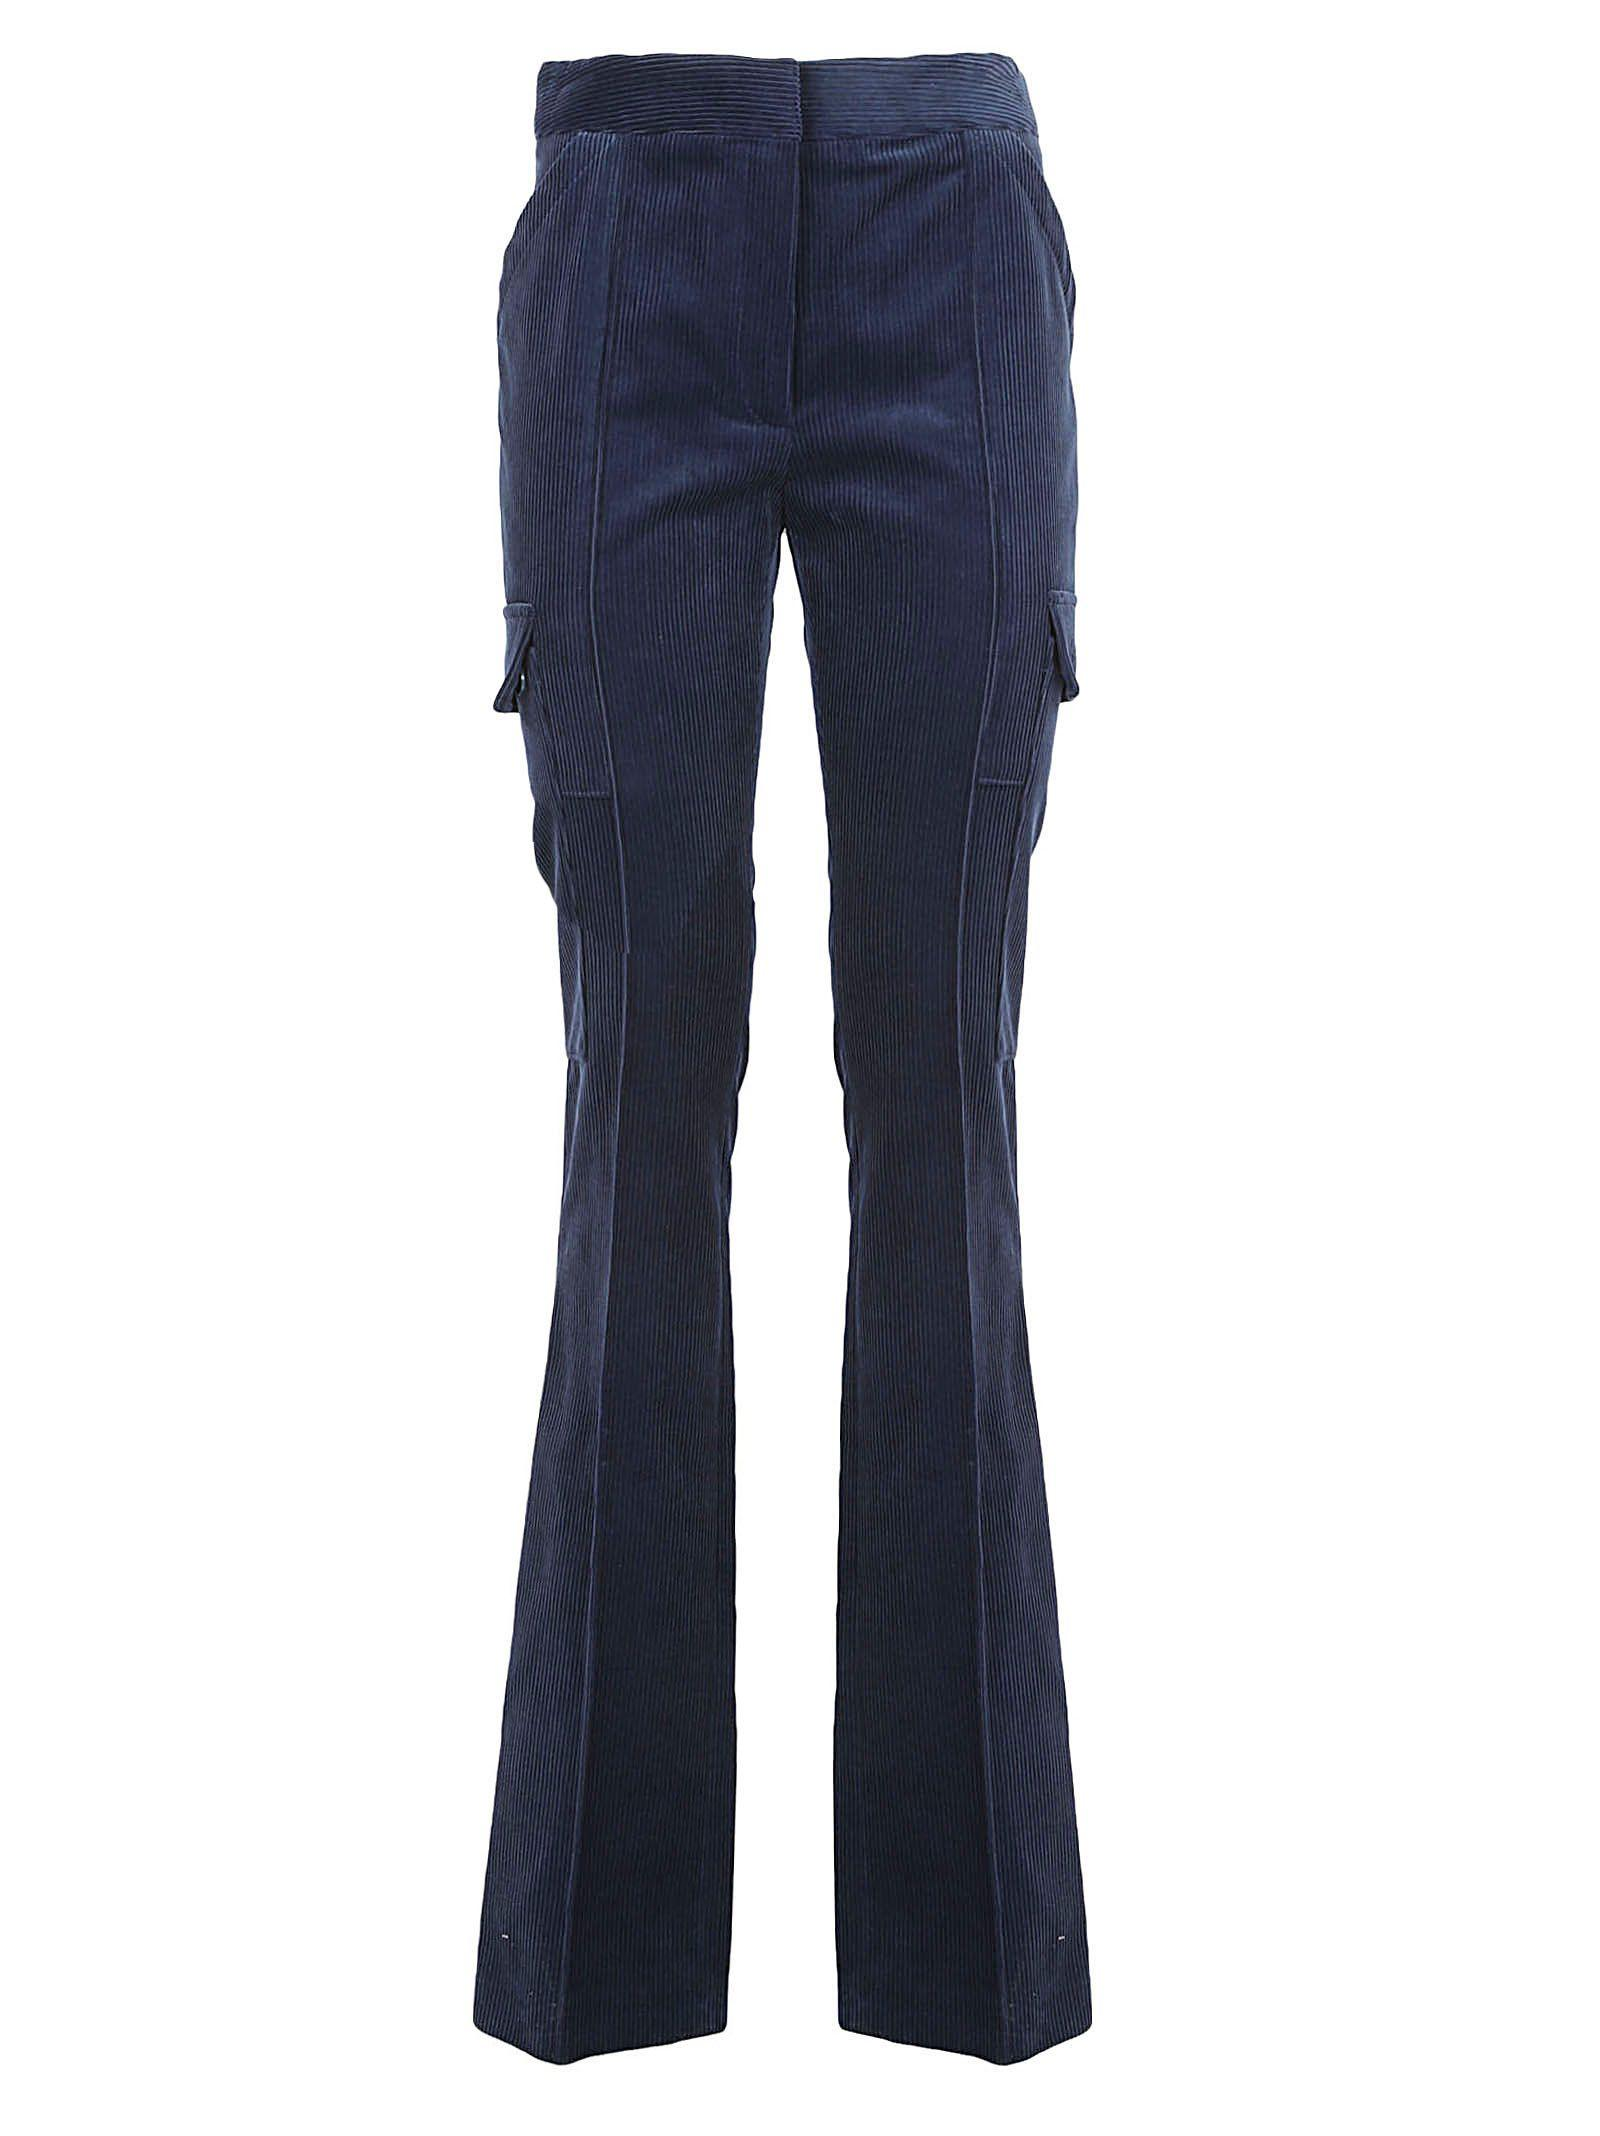 Stella Mccartney Pants In Blue Stone